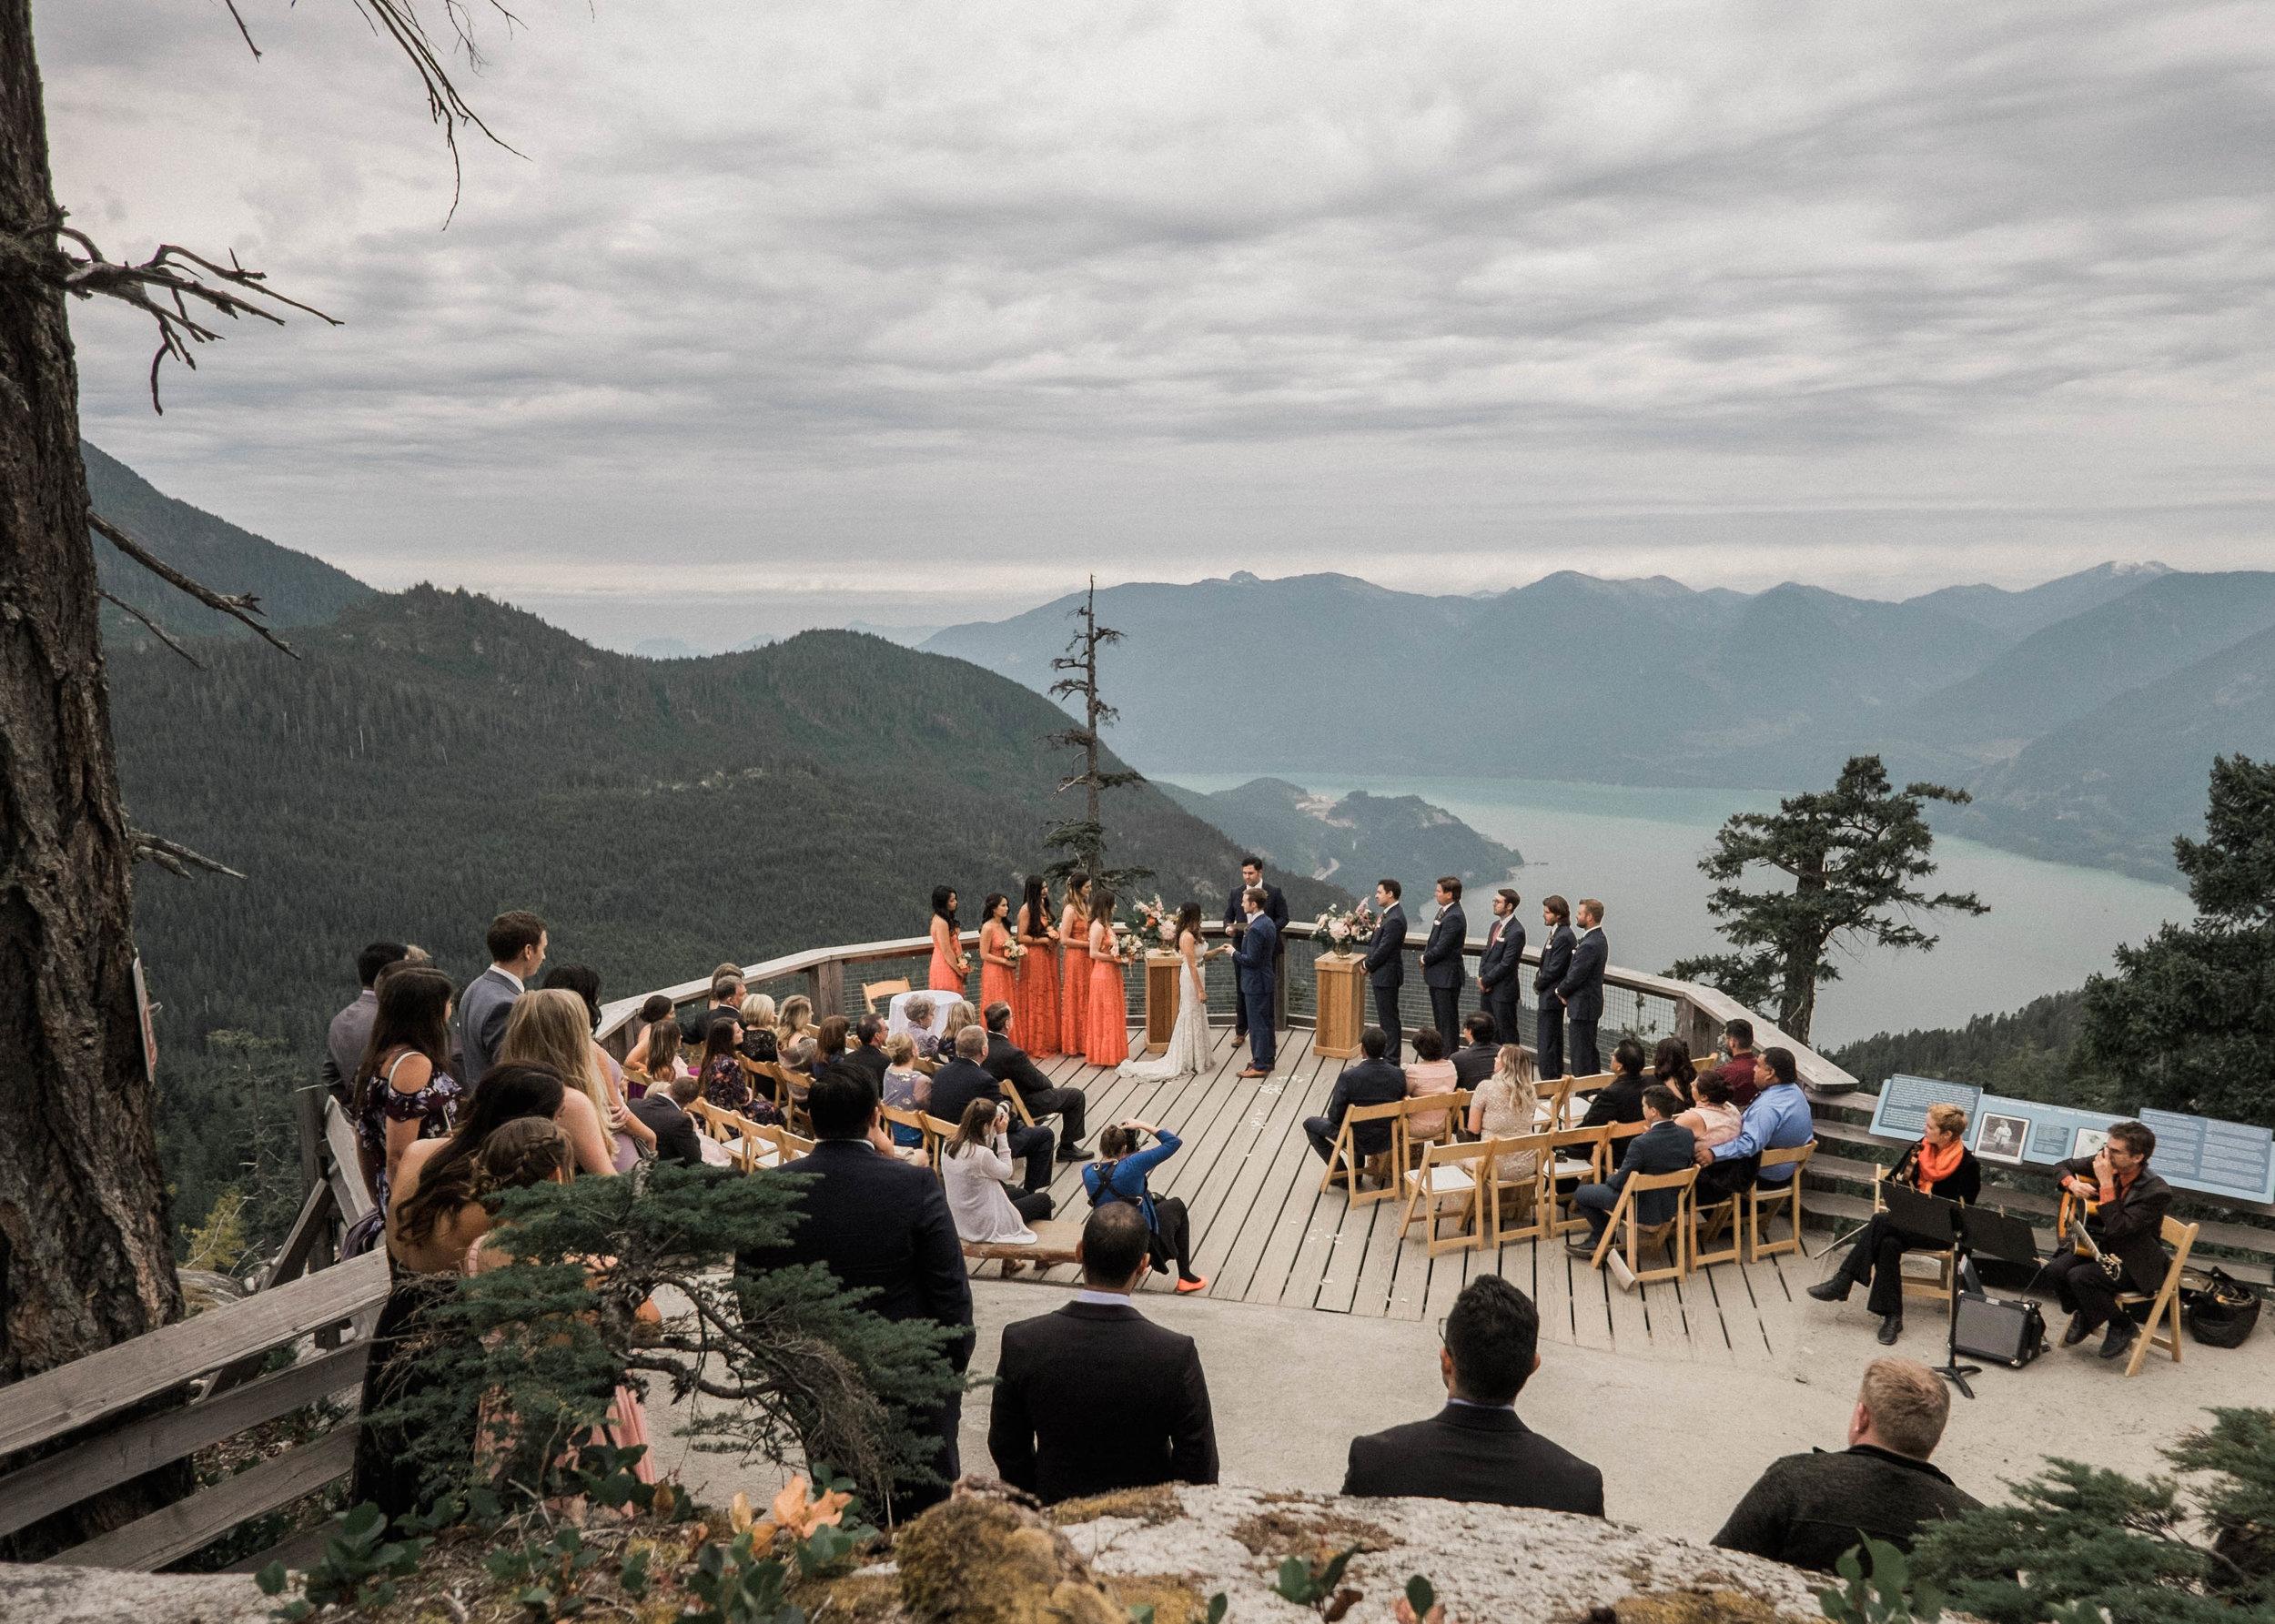 austin-texas-wedding-photography-1778-photographie-90.jpg